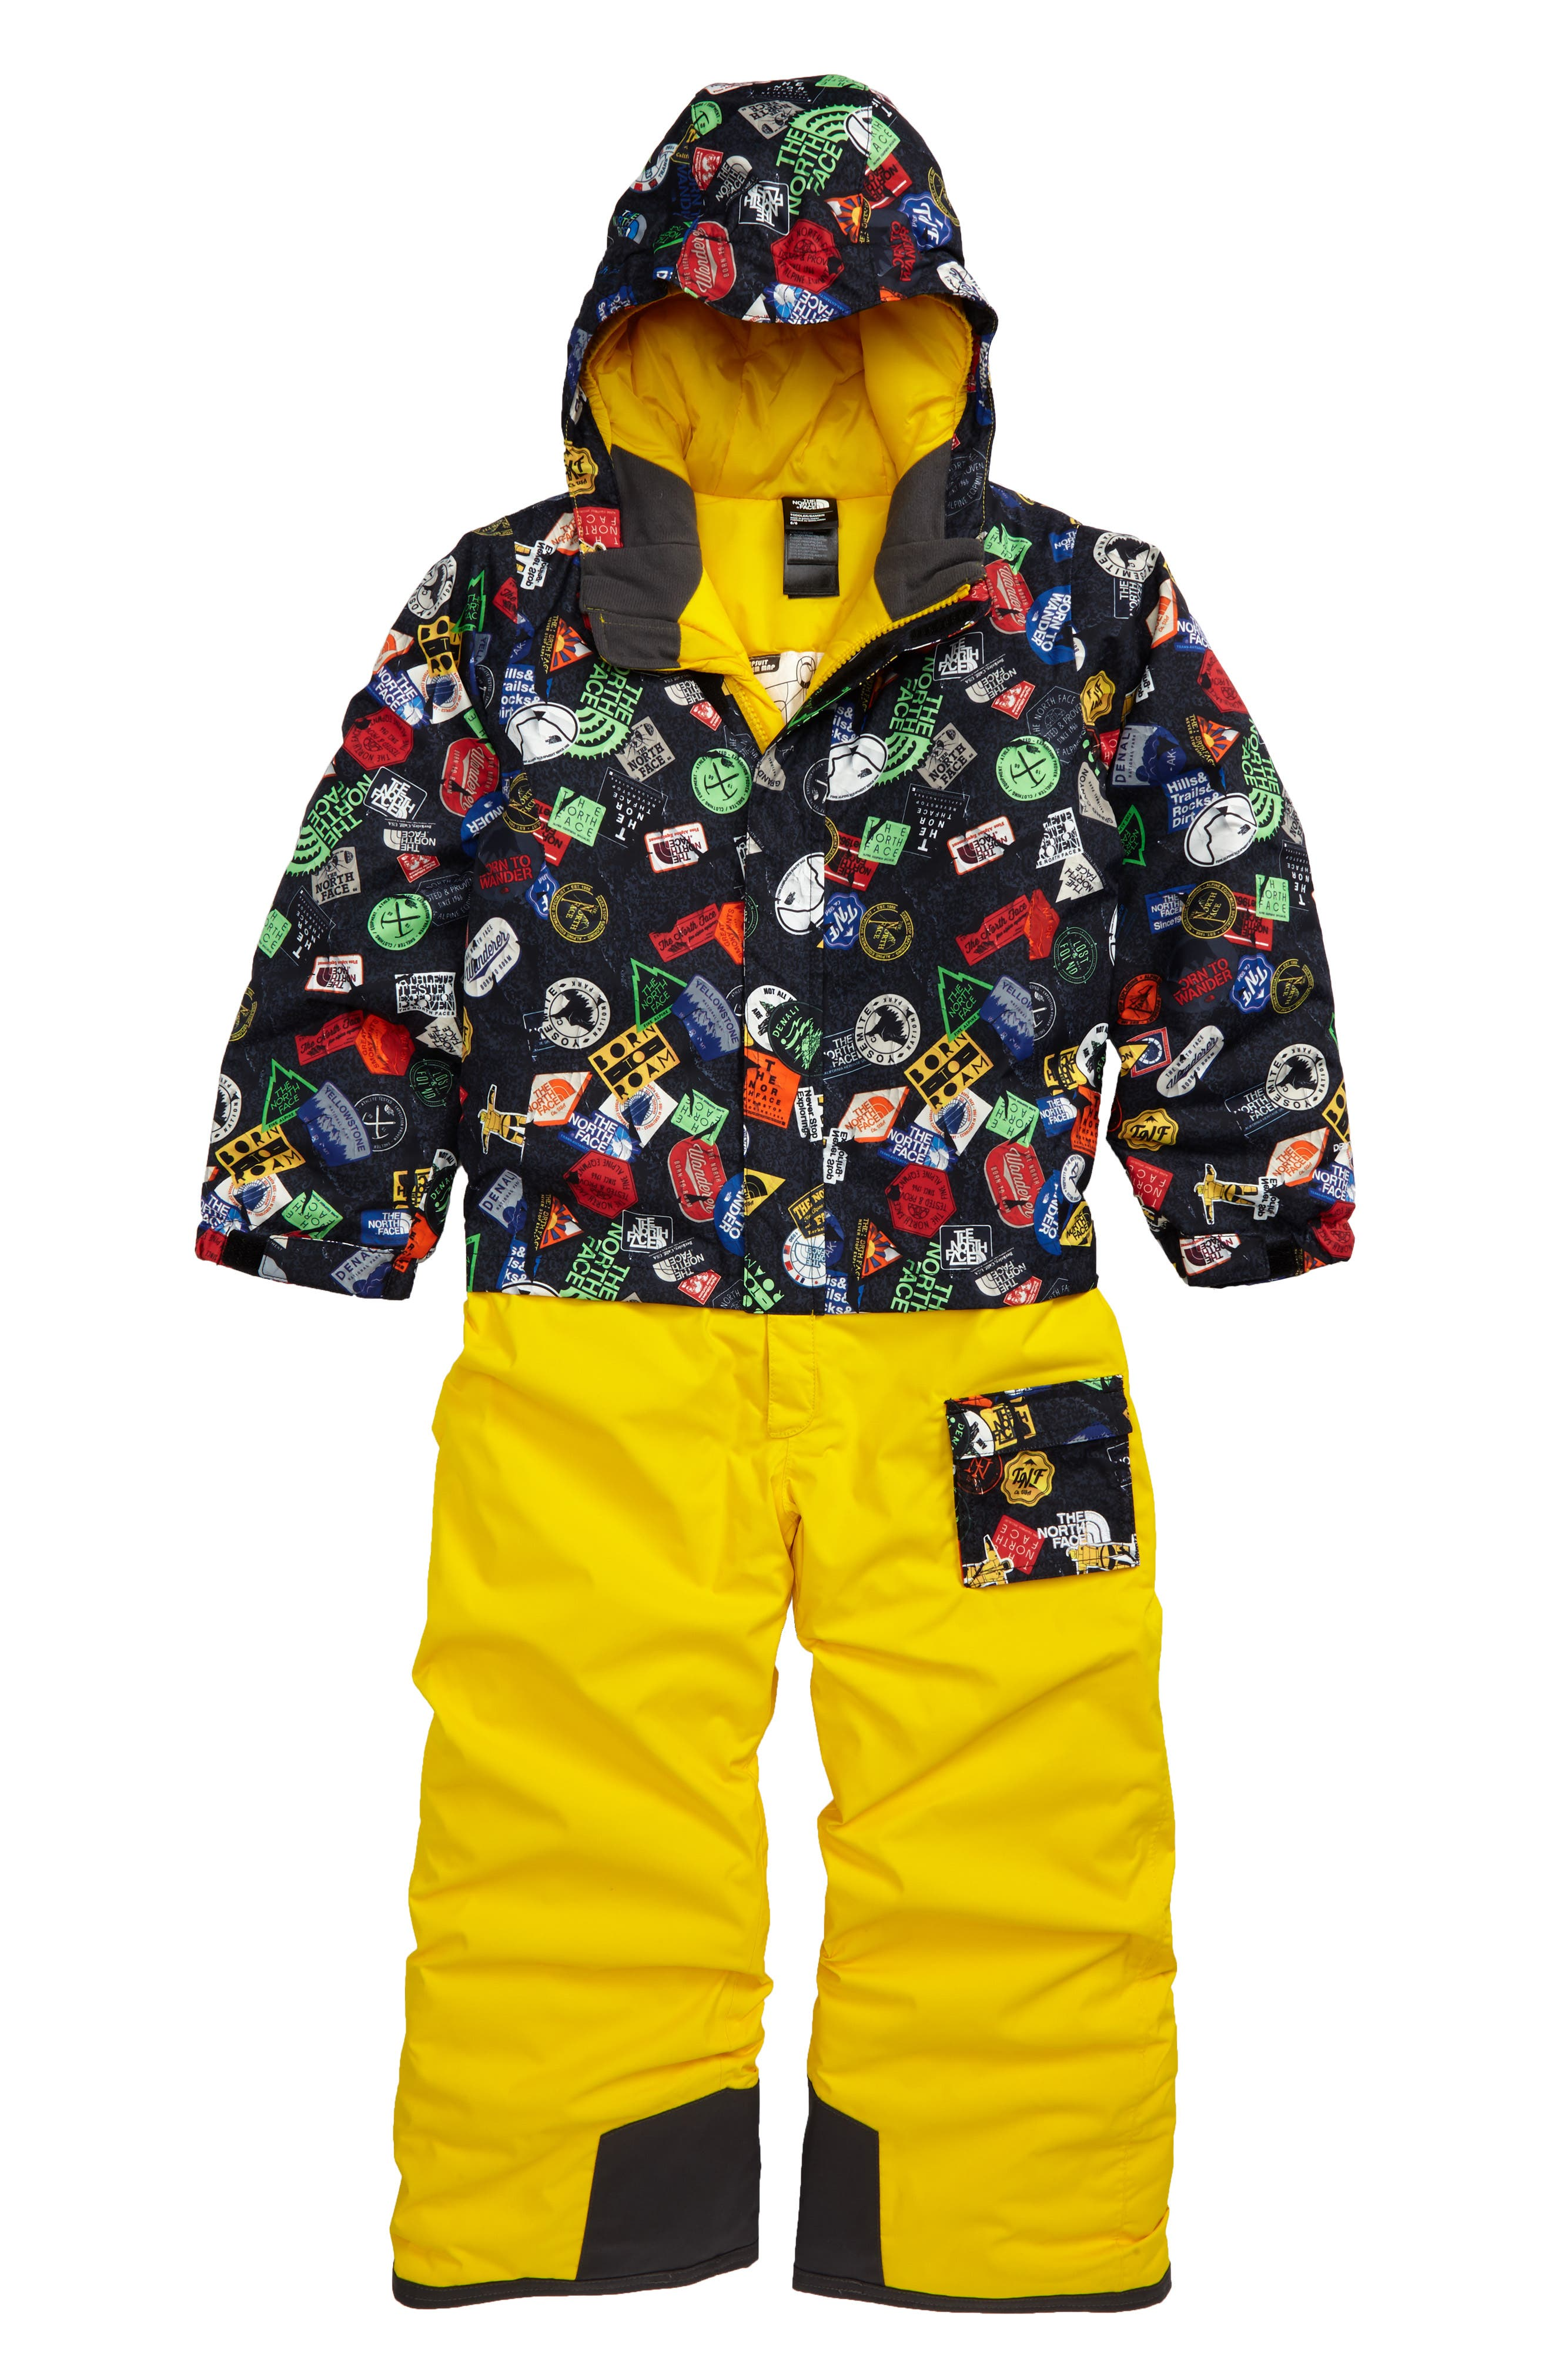 Heatseeker<sup>™</sup> Insulated Waterproof & Windproof Snowsuit,                         Main,                         color, Tnf Black Bombdiggity Print